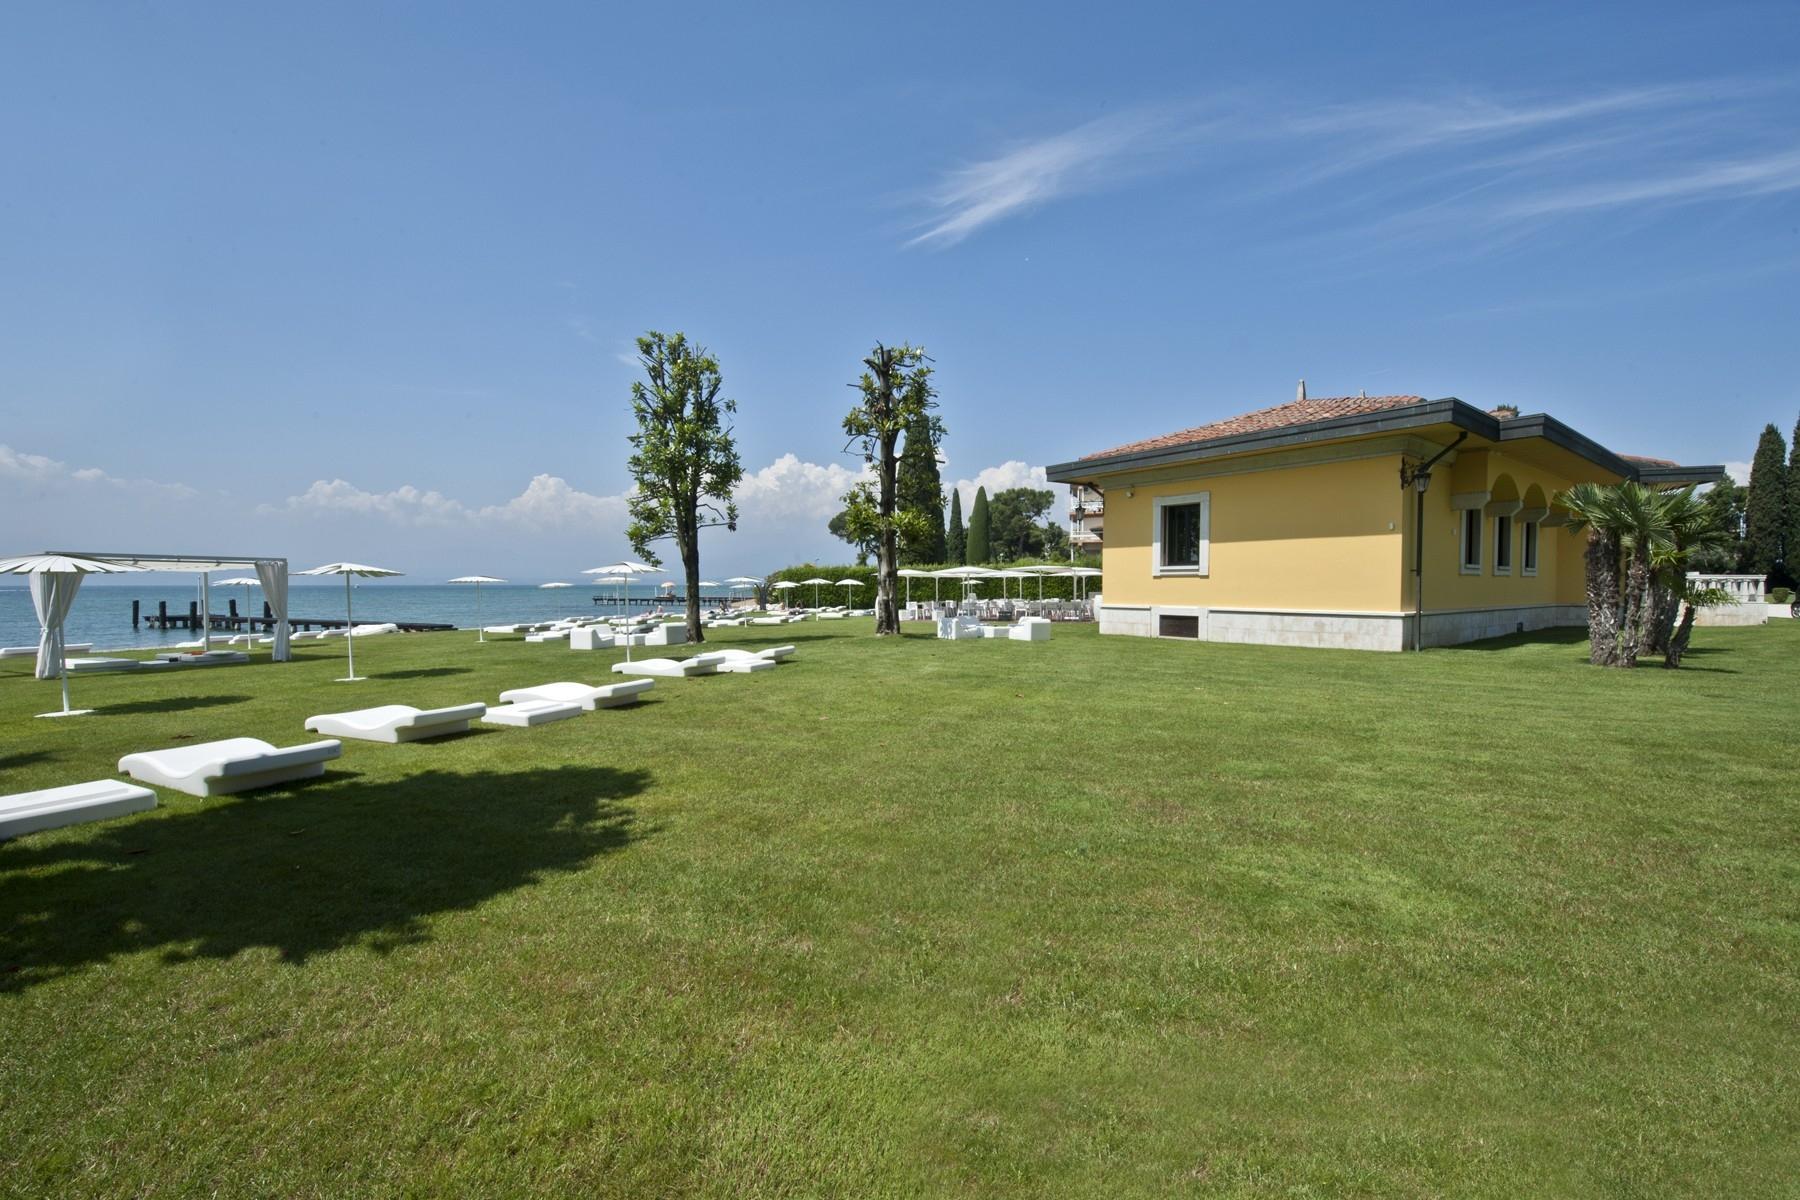 Villa unica pied dans l'eau con spiaggia e pontile a Sirmione - 7